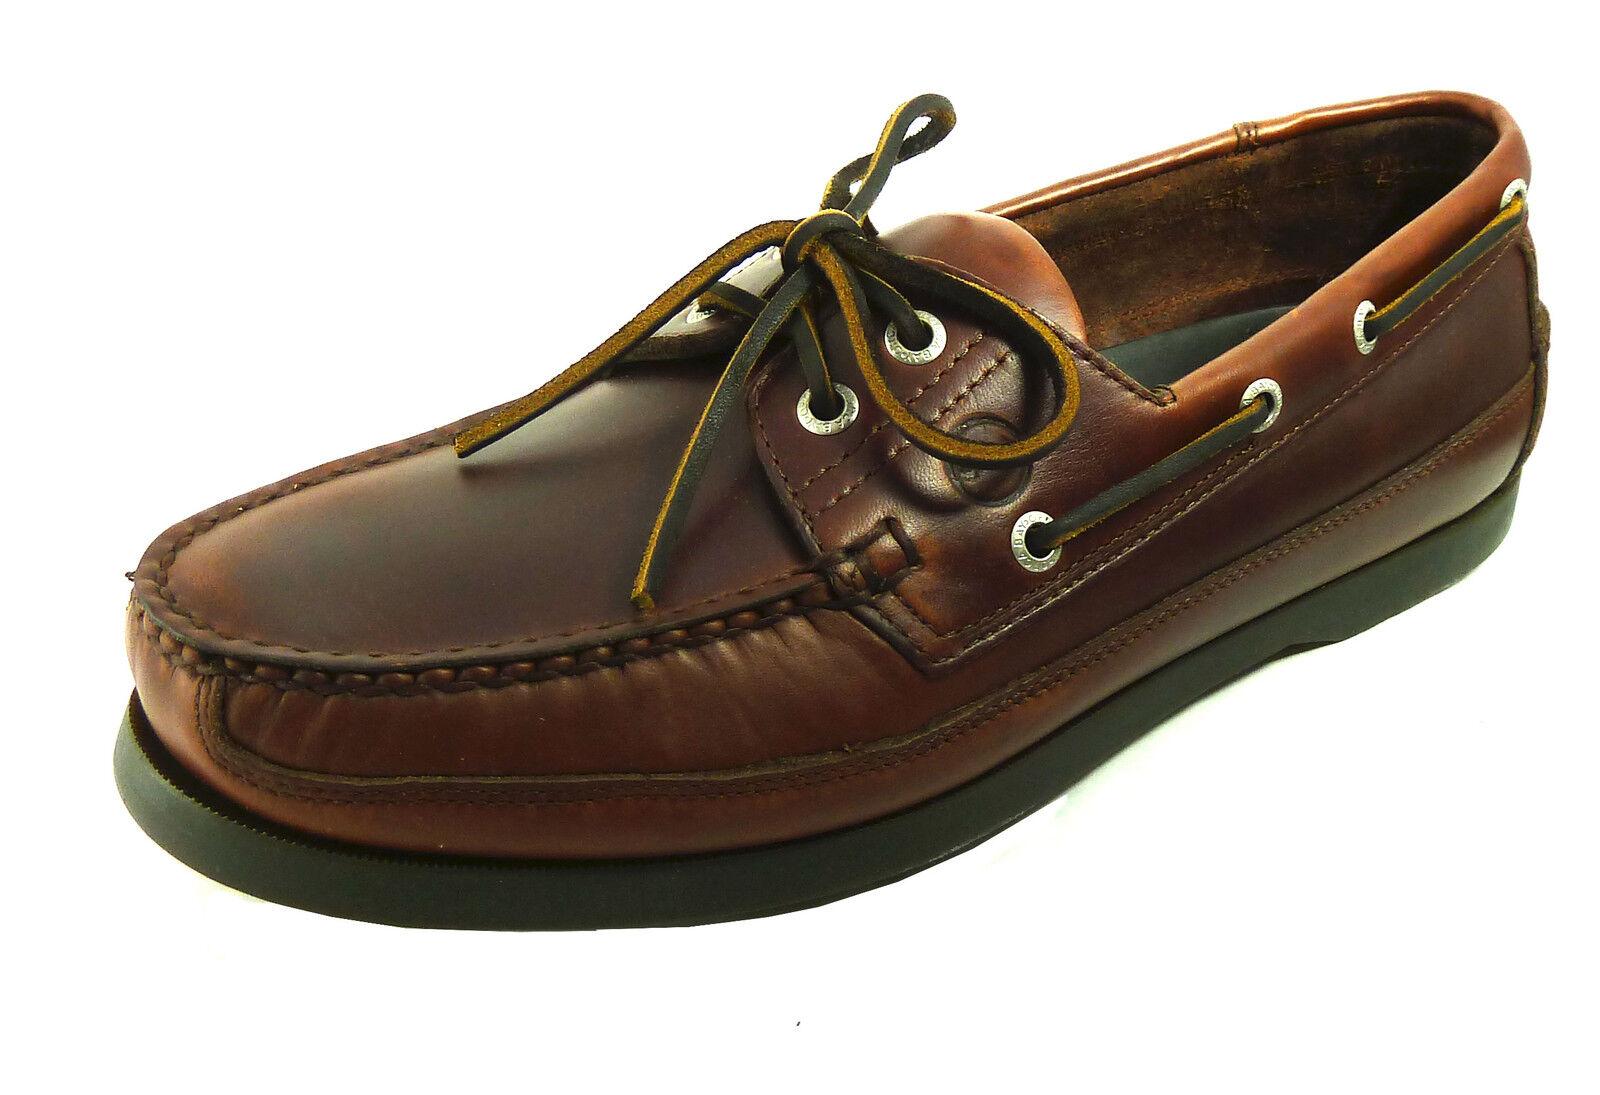 Orca Bay Augusta Men's Deck Shoe - Handstitched 100% Leather Shoes